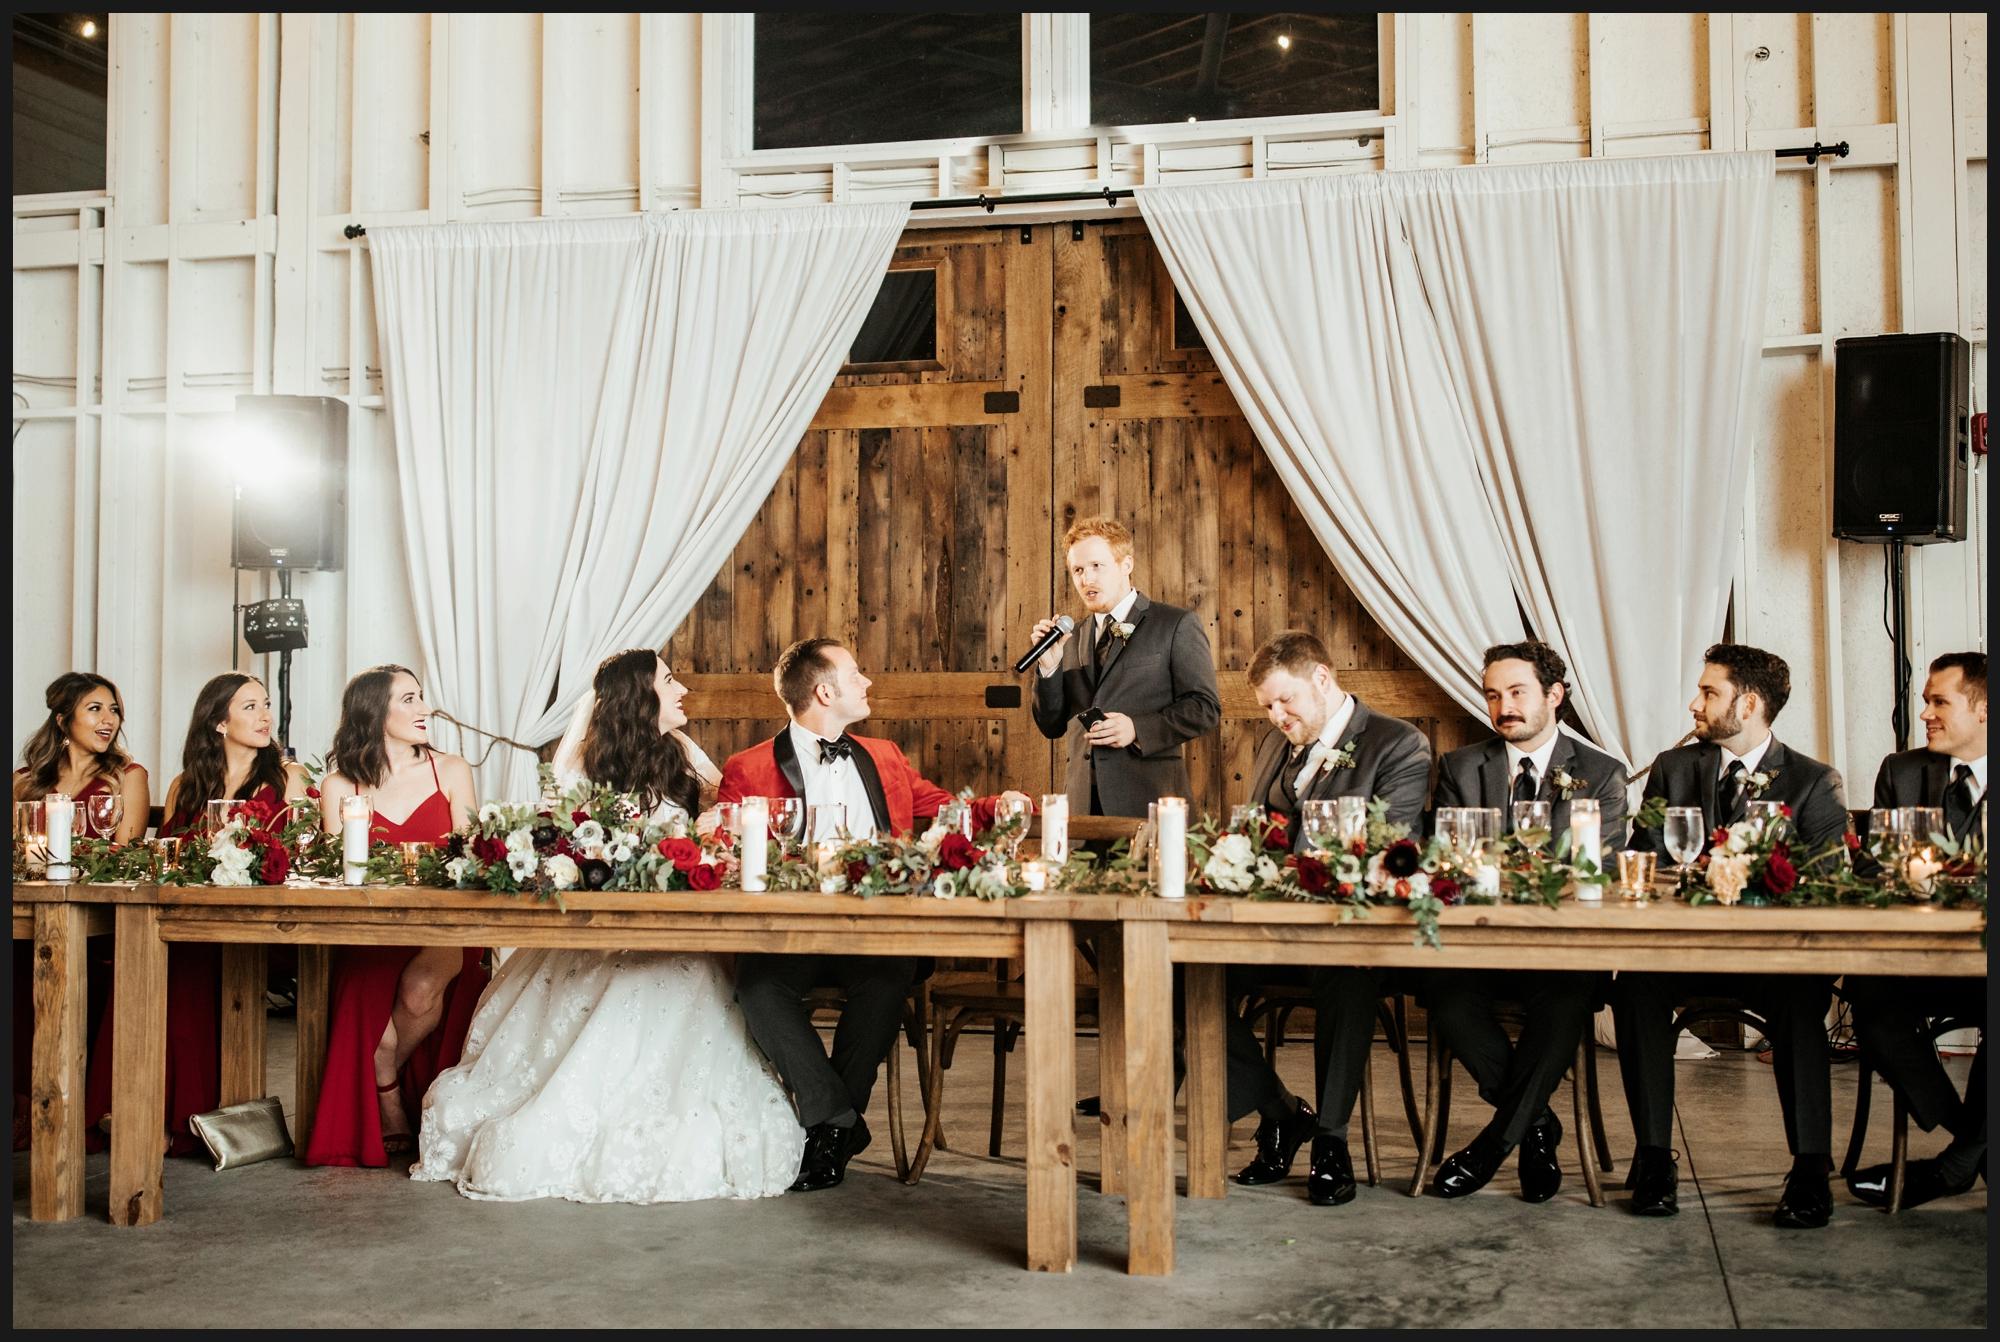 Orlando-Wedding-Photographer-destination-wedding-photographer-florida-wedding-photographer-hawaii-wedding-photographer_0537.jpg